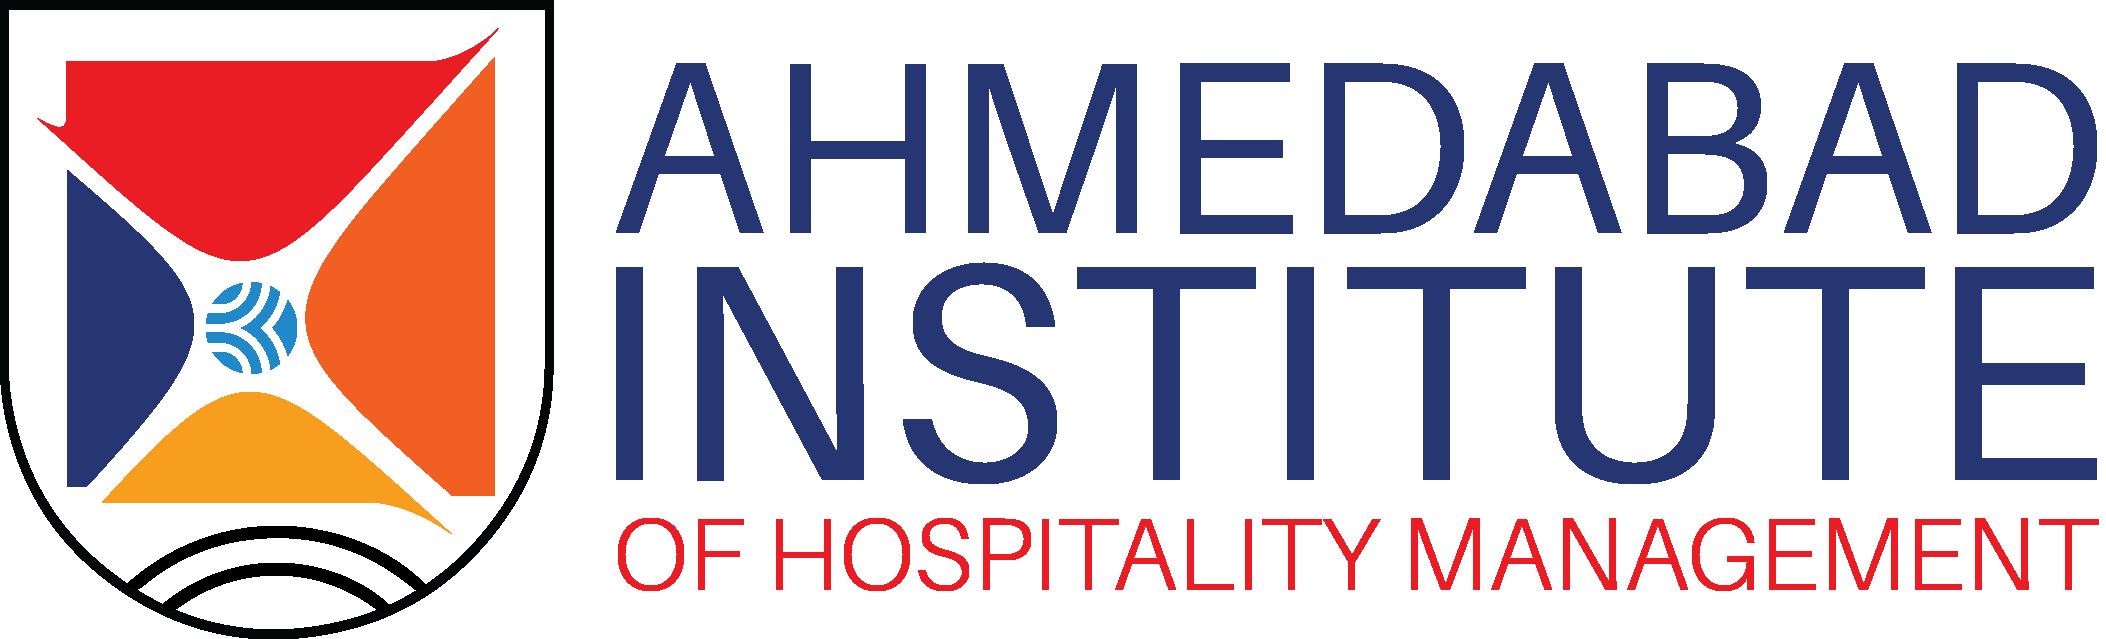 Ahmedabad Institute of Hospitality Management